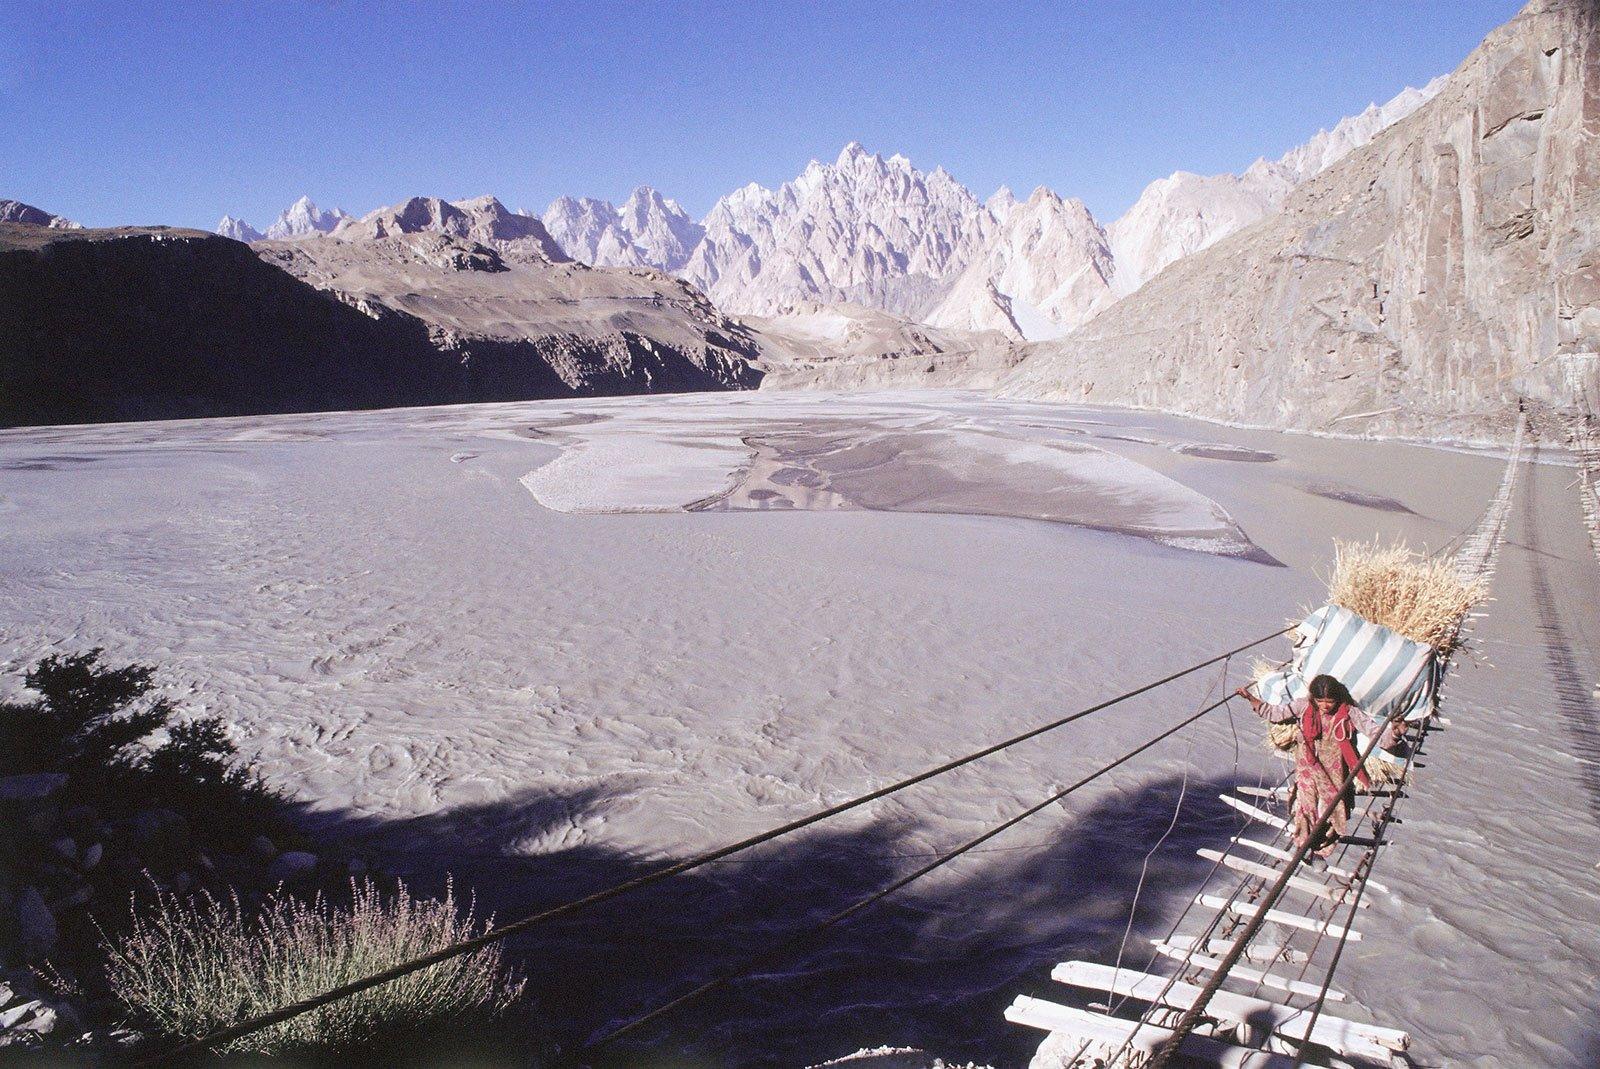 Puente de Hussaini. Sobre las aguas en Pakistán